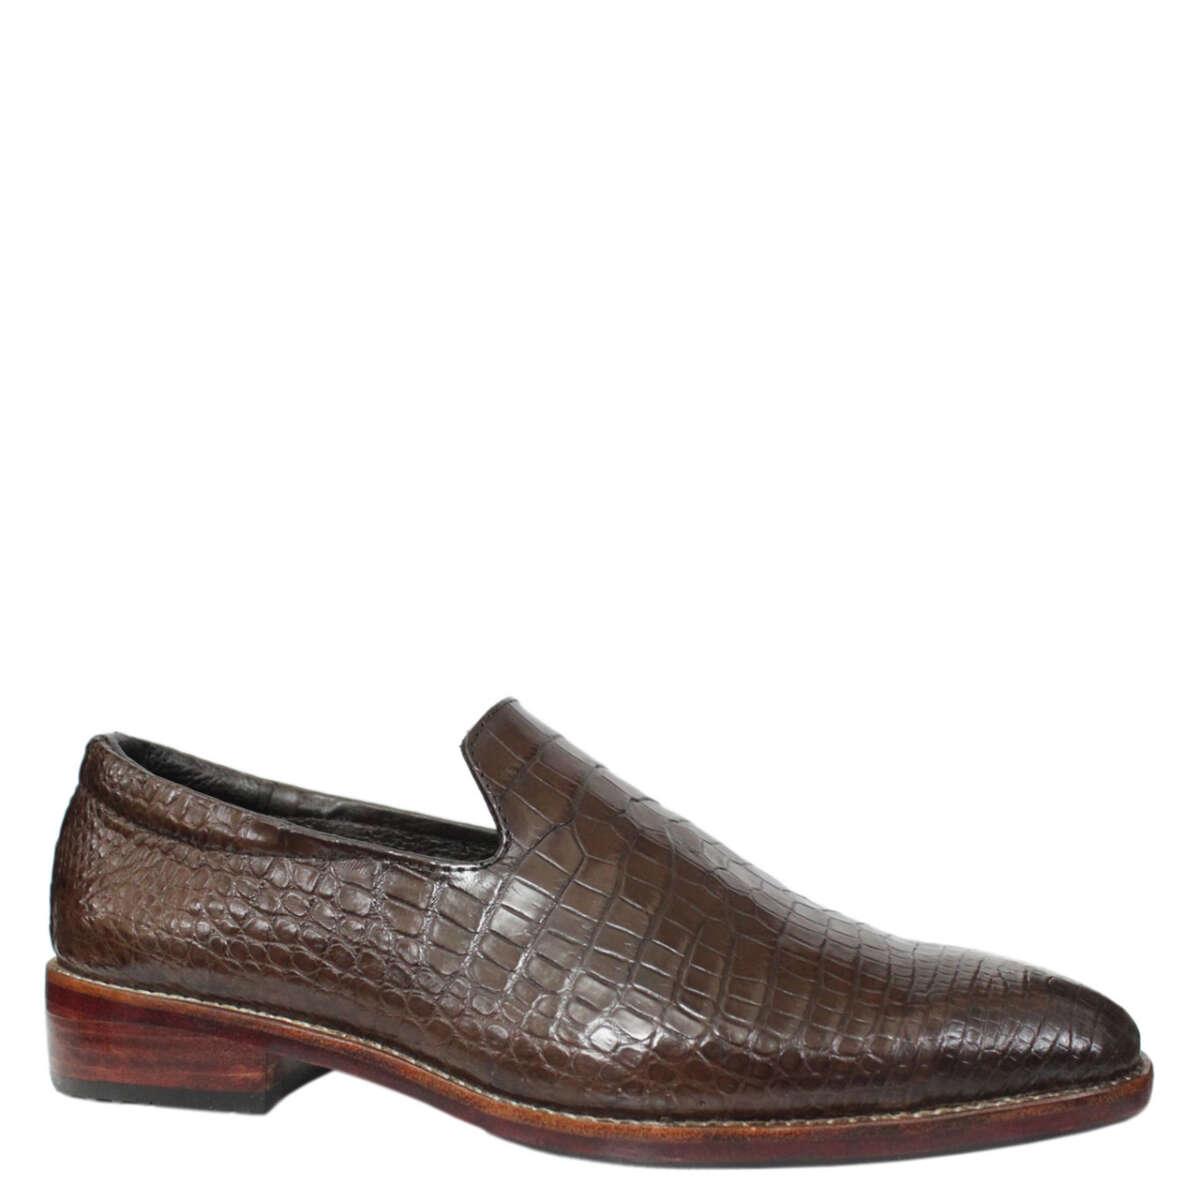 Giày nam da cá sấu S880a